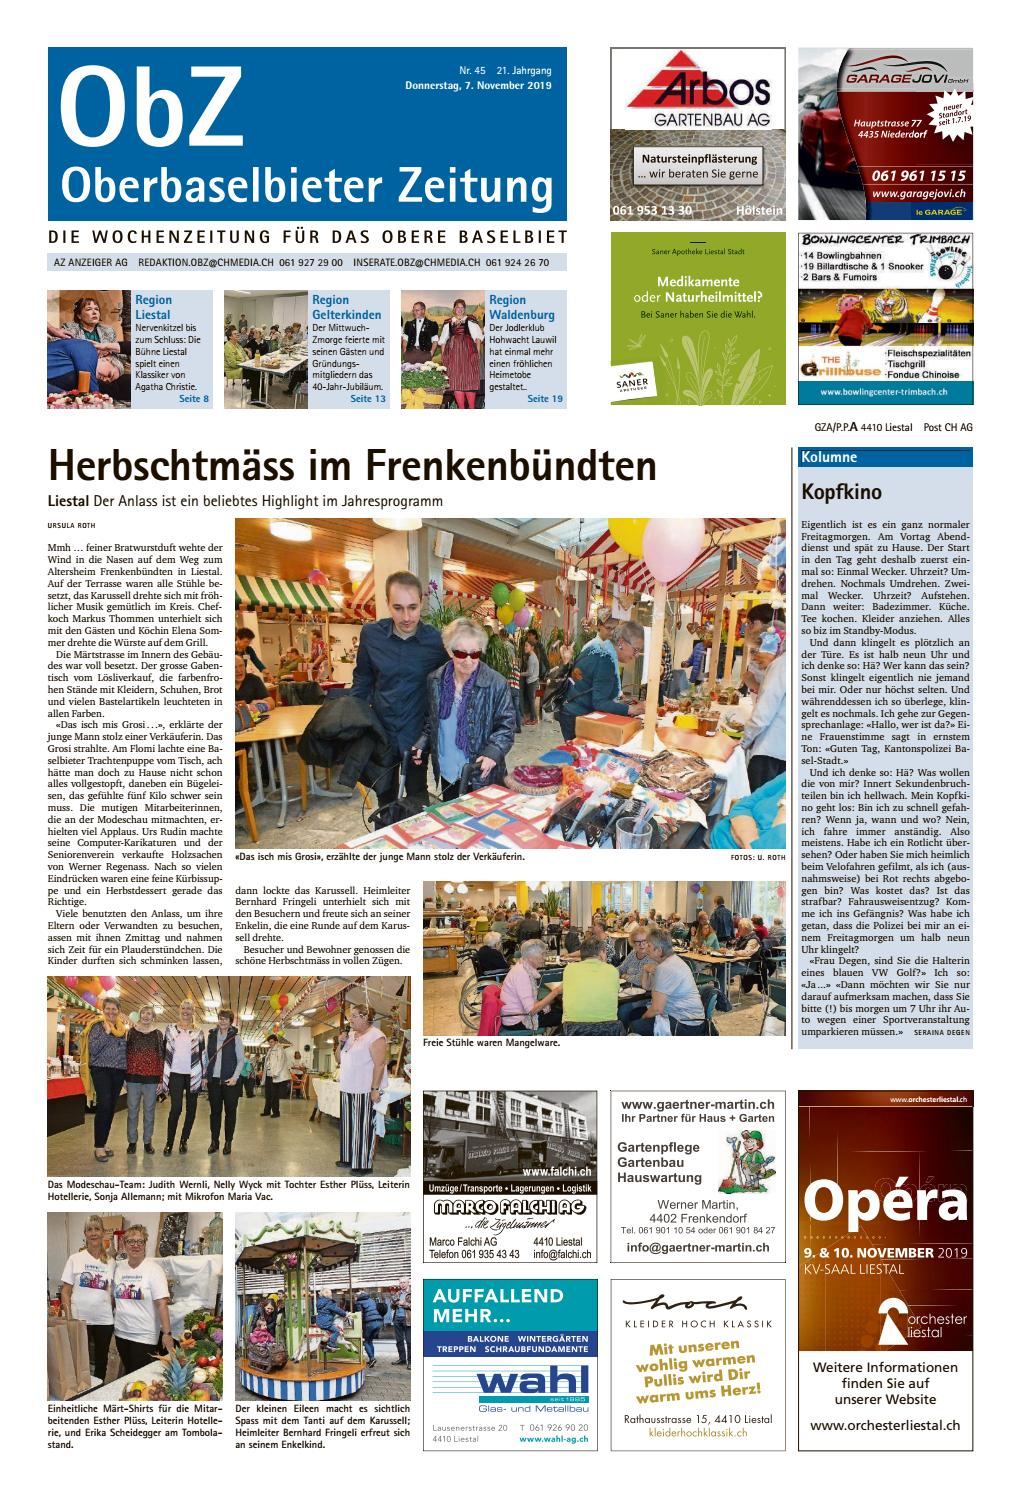 Partnervermittlung Kostenlos Rapperswil-Jona, Sex Date Lostorf